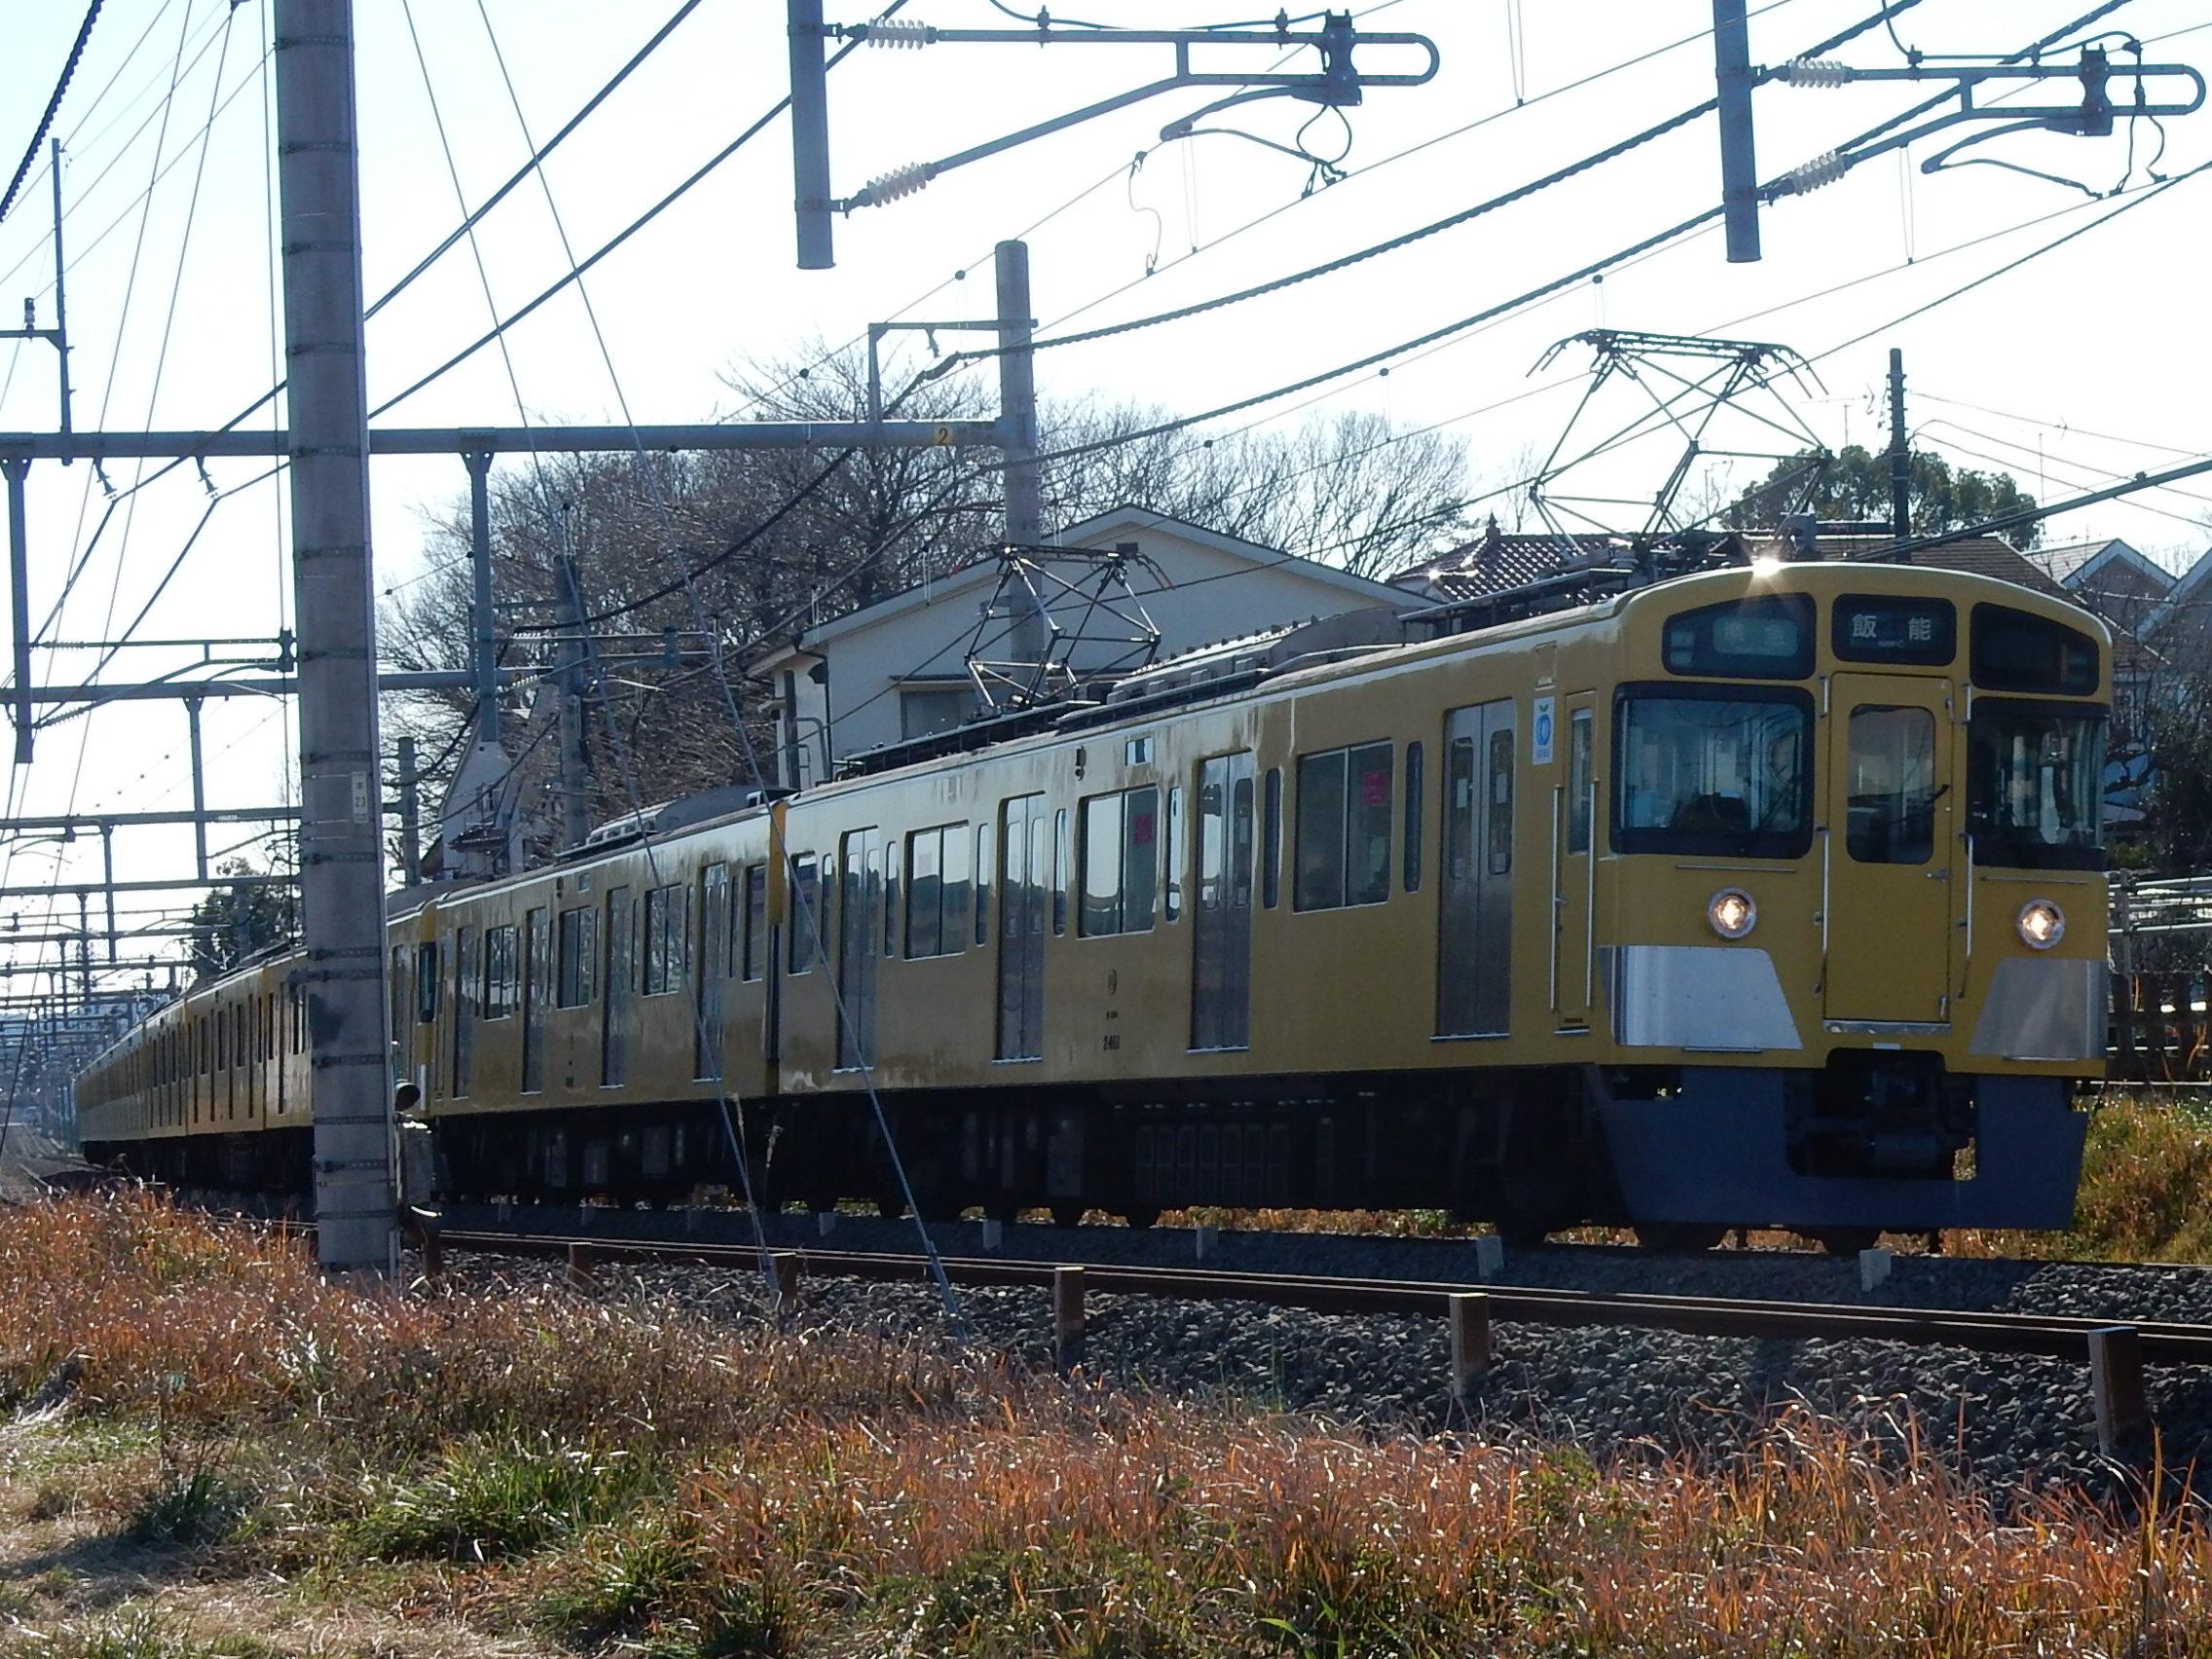 RSCN9858.jpg